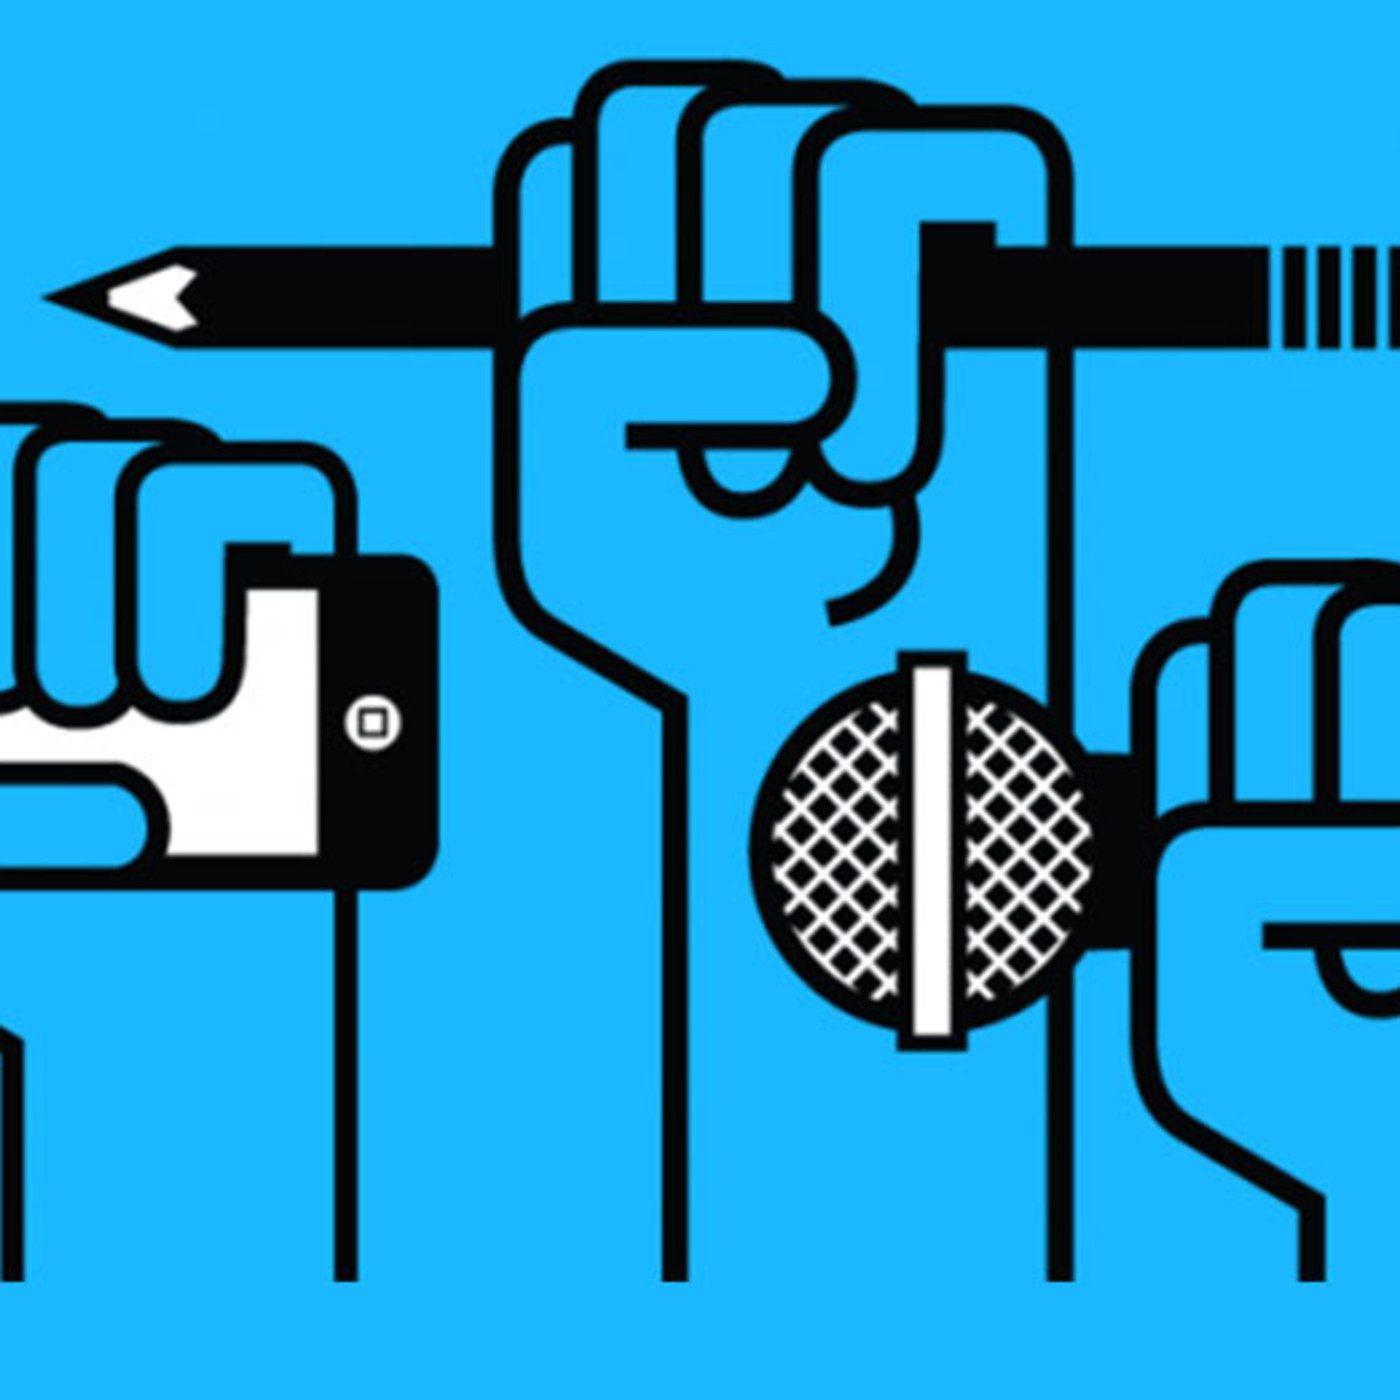 La Ciudad Secreta 68 – Periodismo precario